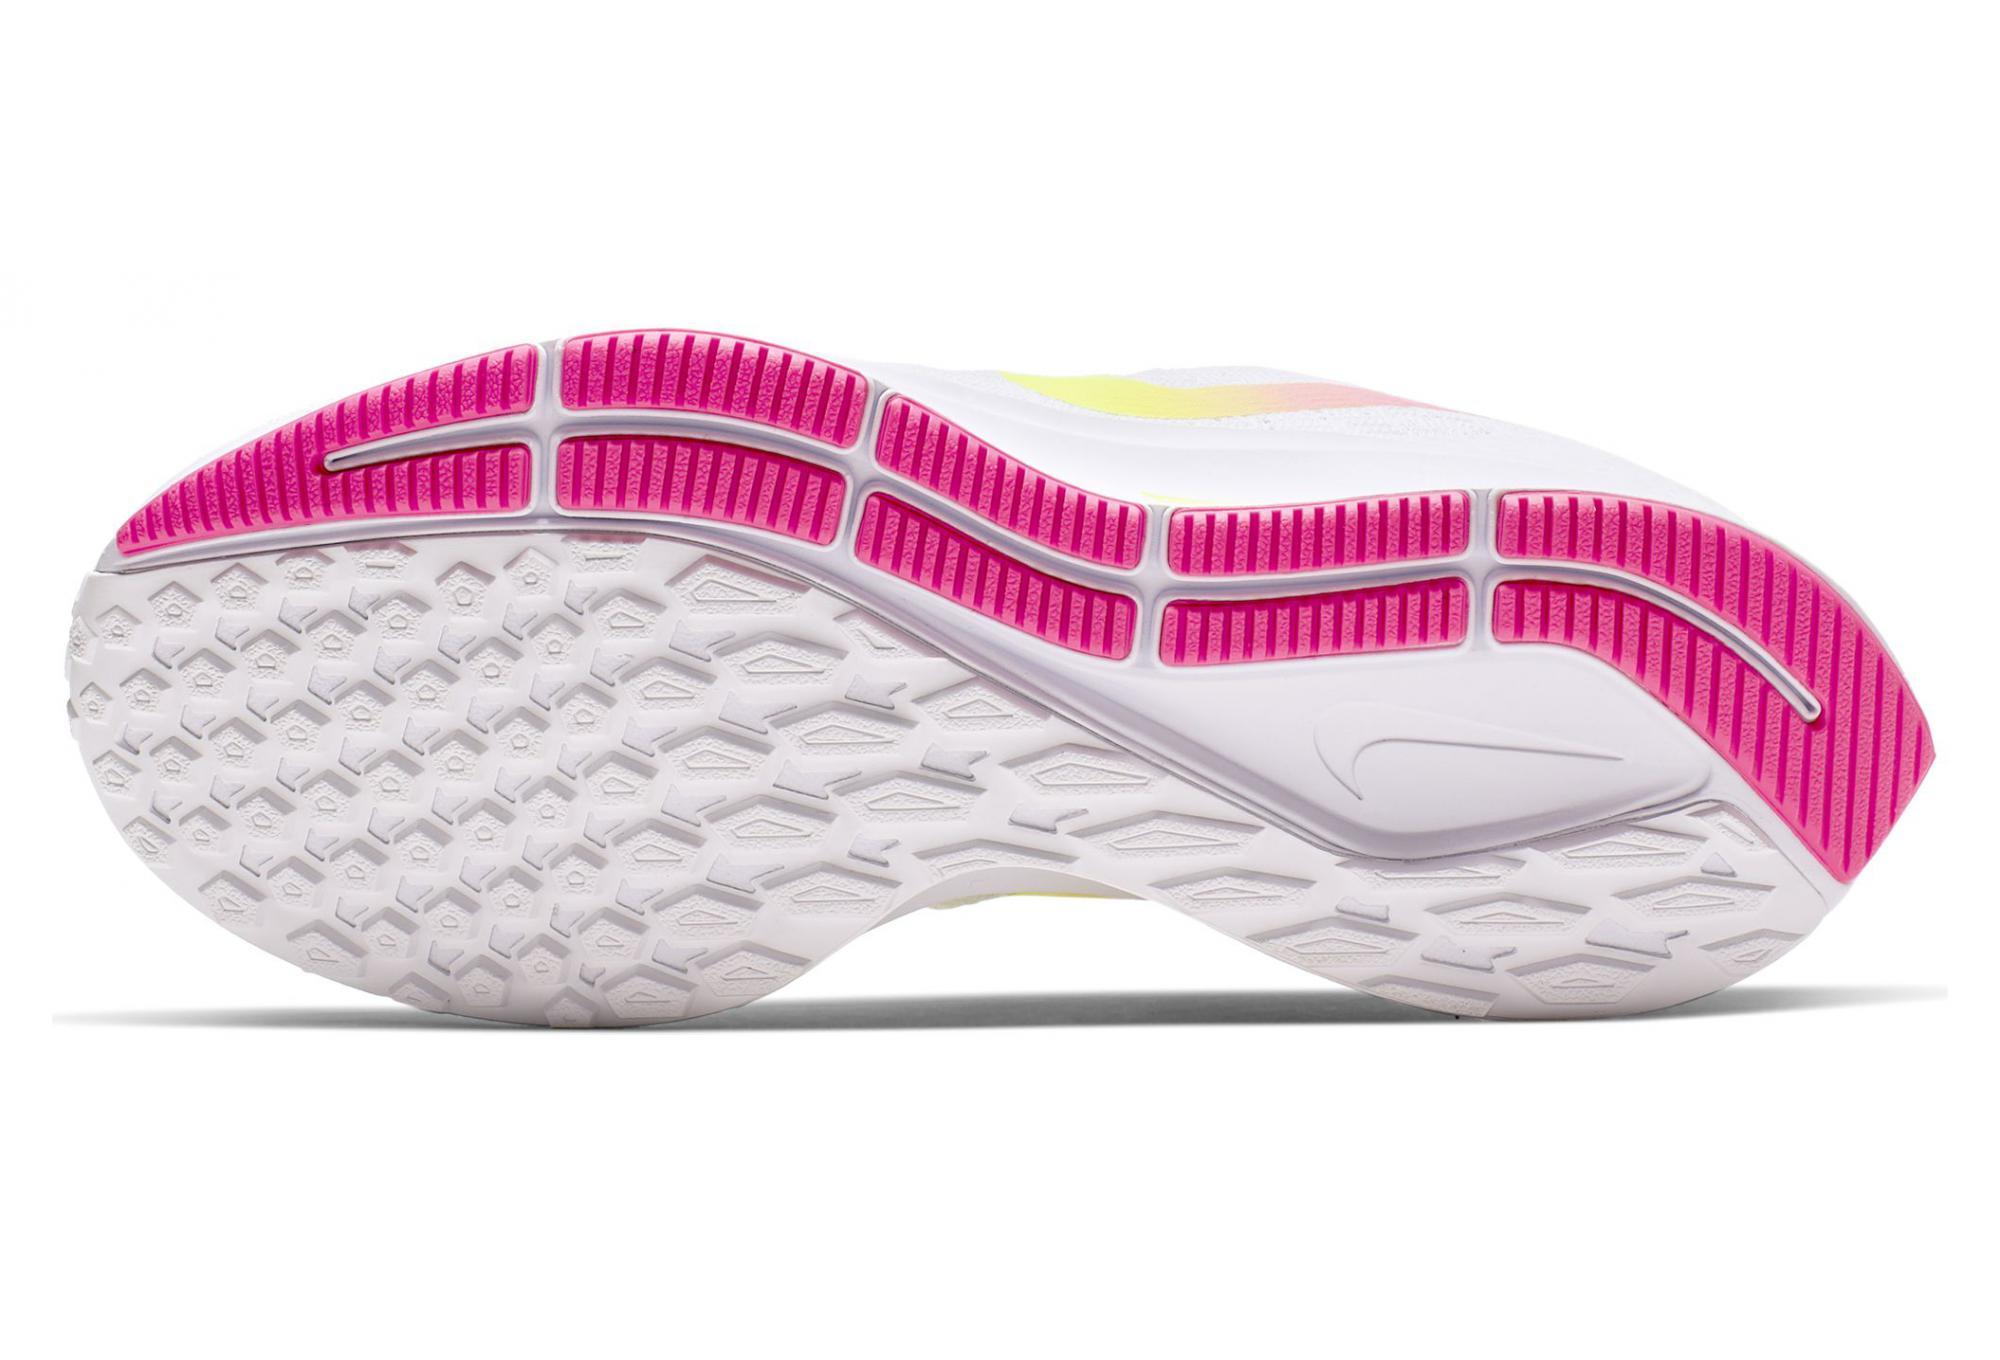 Scarpe da Running Nike Air Zoom Pegasus 35 Bianco Giallo Rosa da Donna